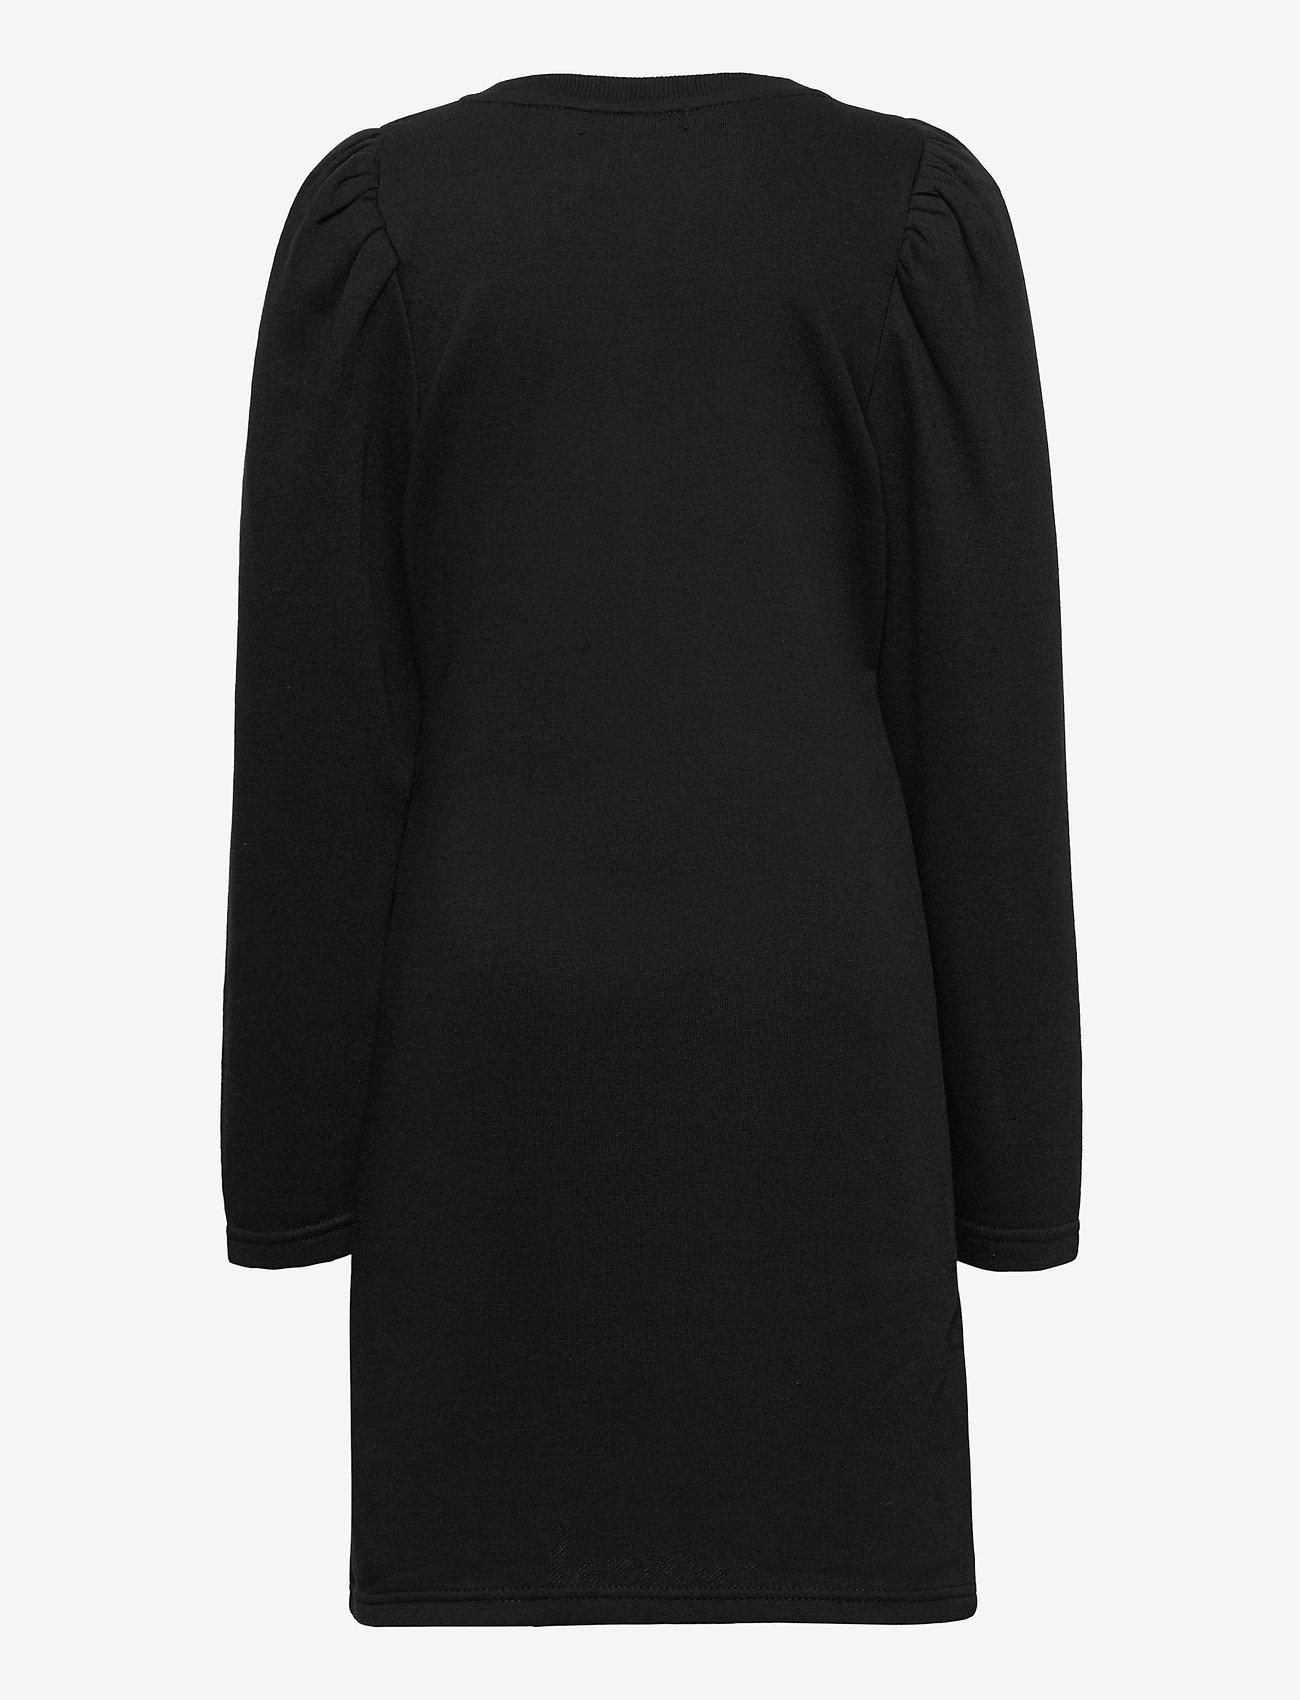 LMTD - NLFTINKER LS SWEAT DRESS - kleider - black - 1